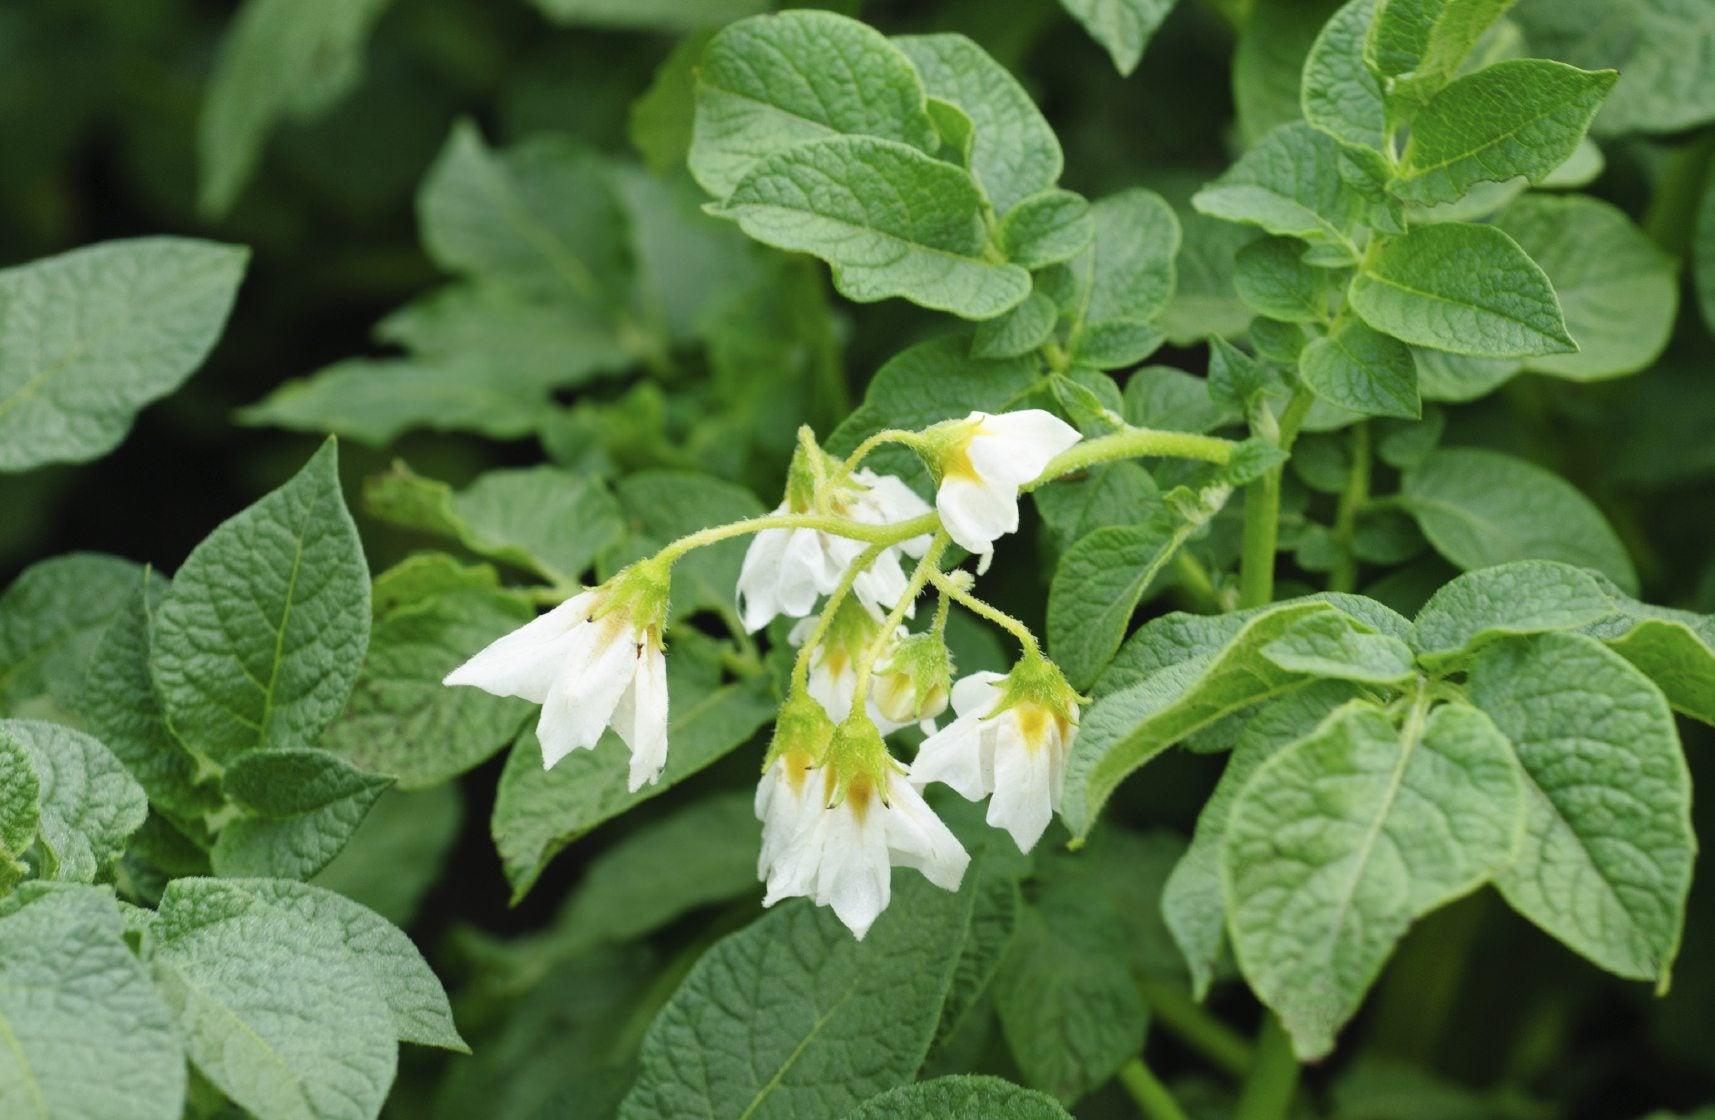 Solanum information types of solanum plants in the garden for Garden plant information